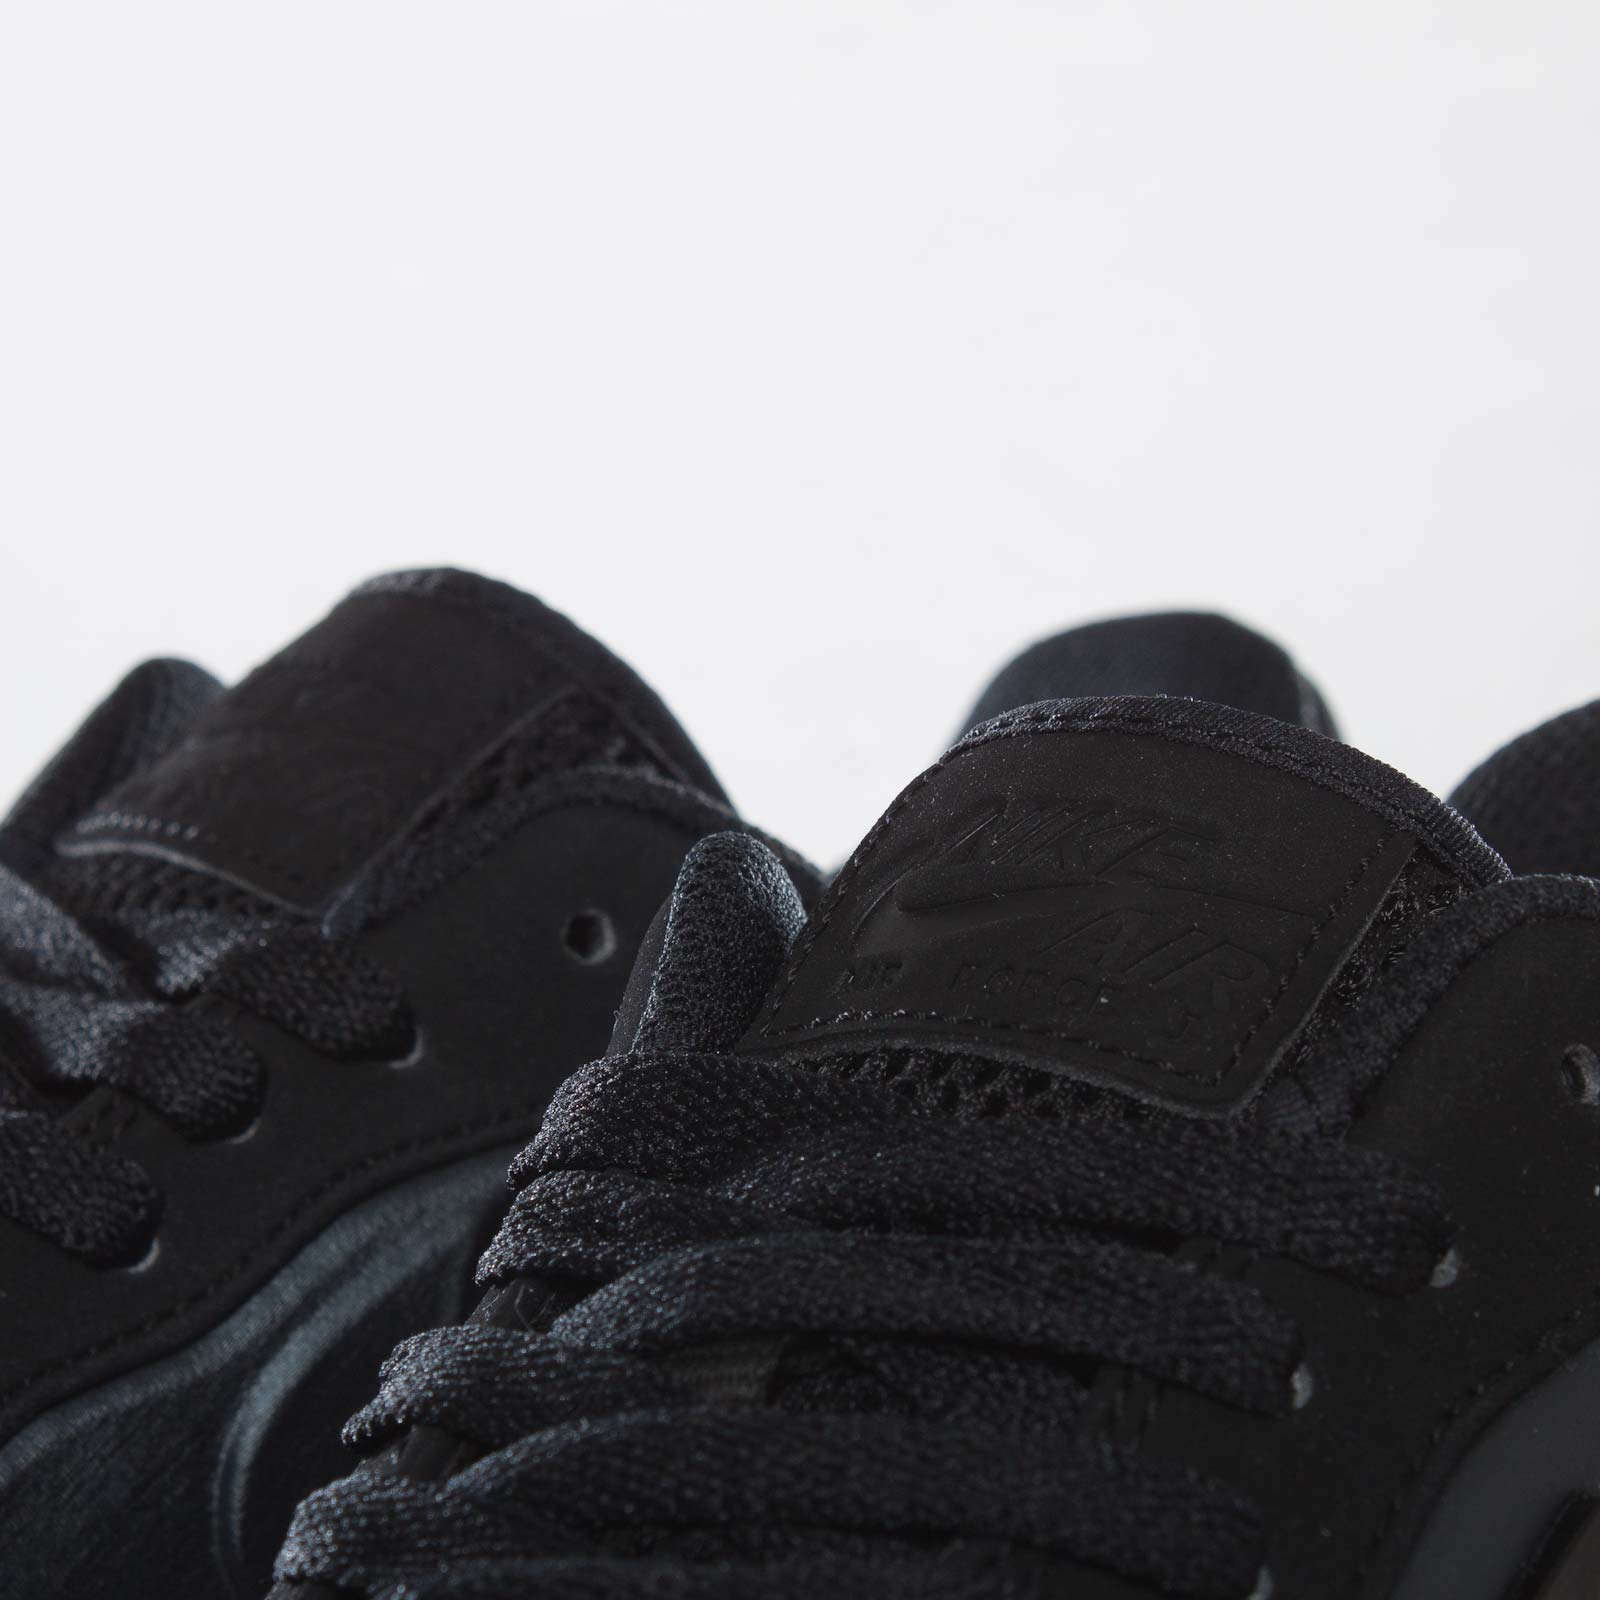 cf6601c1426 Nike Air Force 1 Posite FL Max QS - 548968-010 - Sneakersnstuff ...